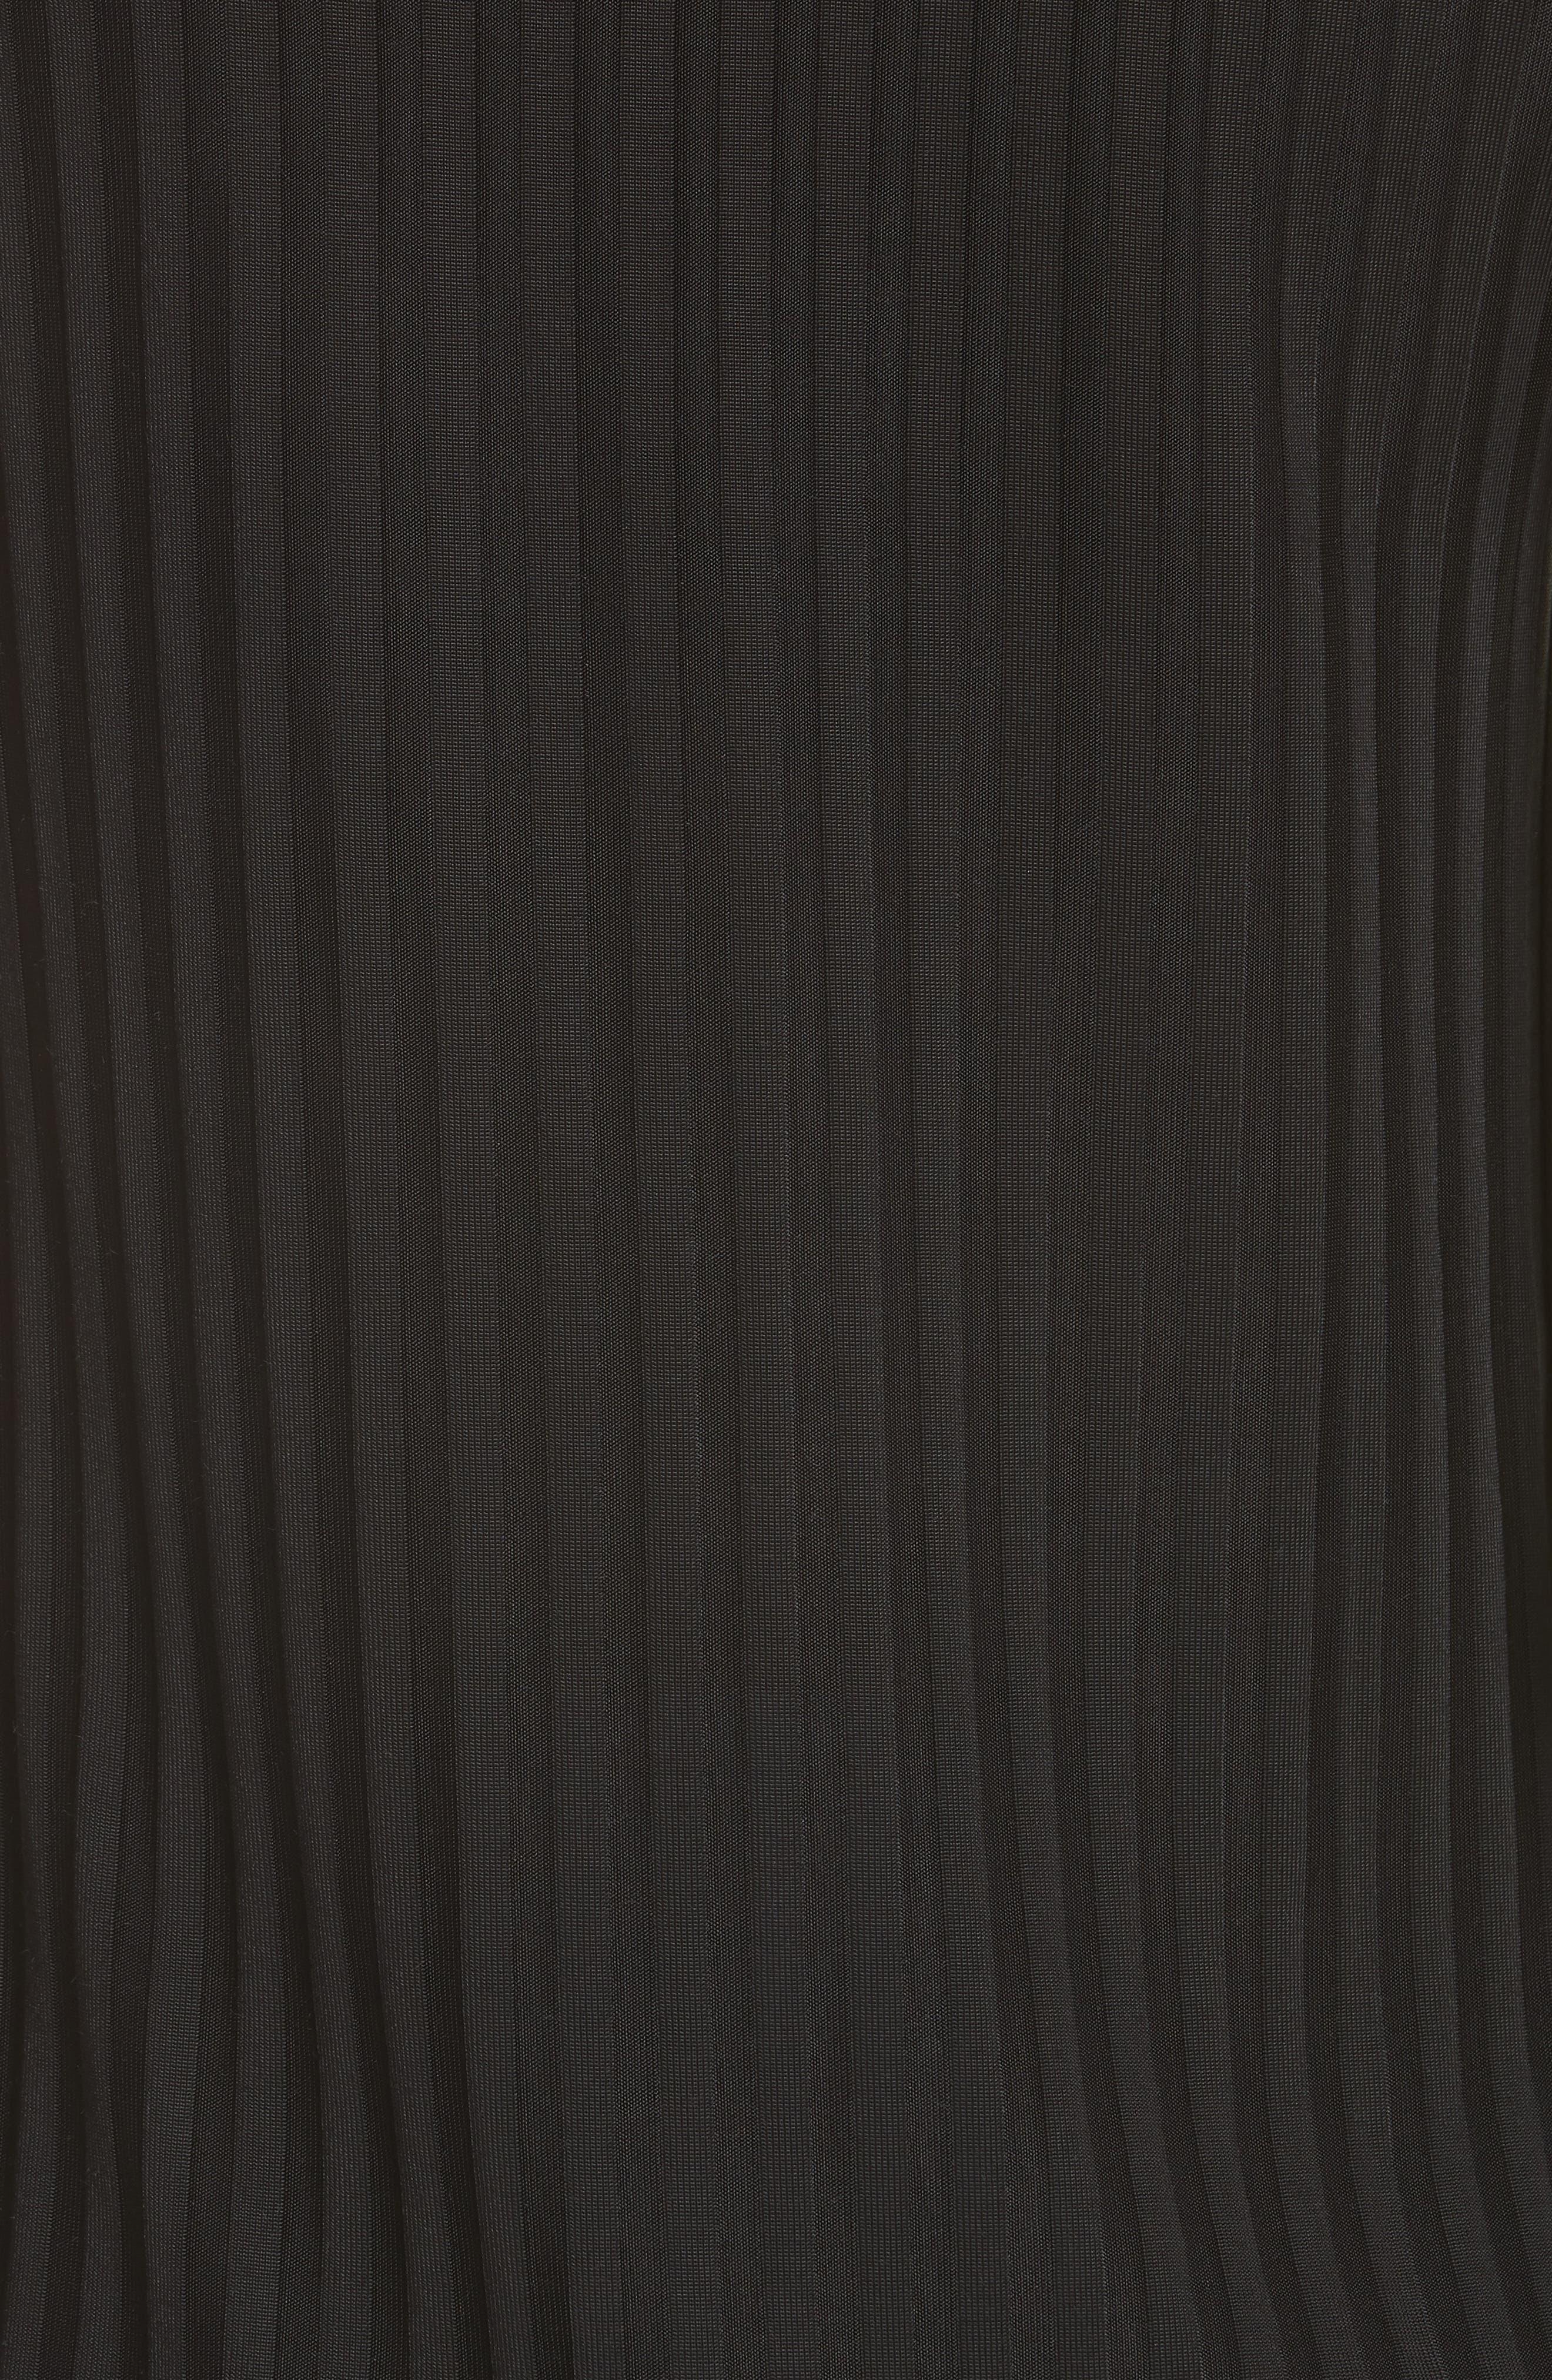 Ribbed Stretch Knit Tank,                             Alternate thumbnail 5, color,                             Noir